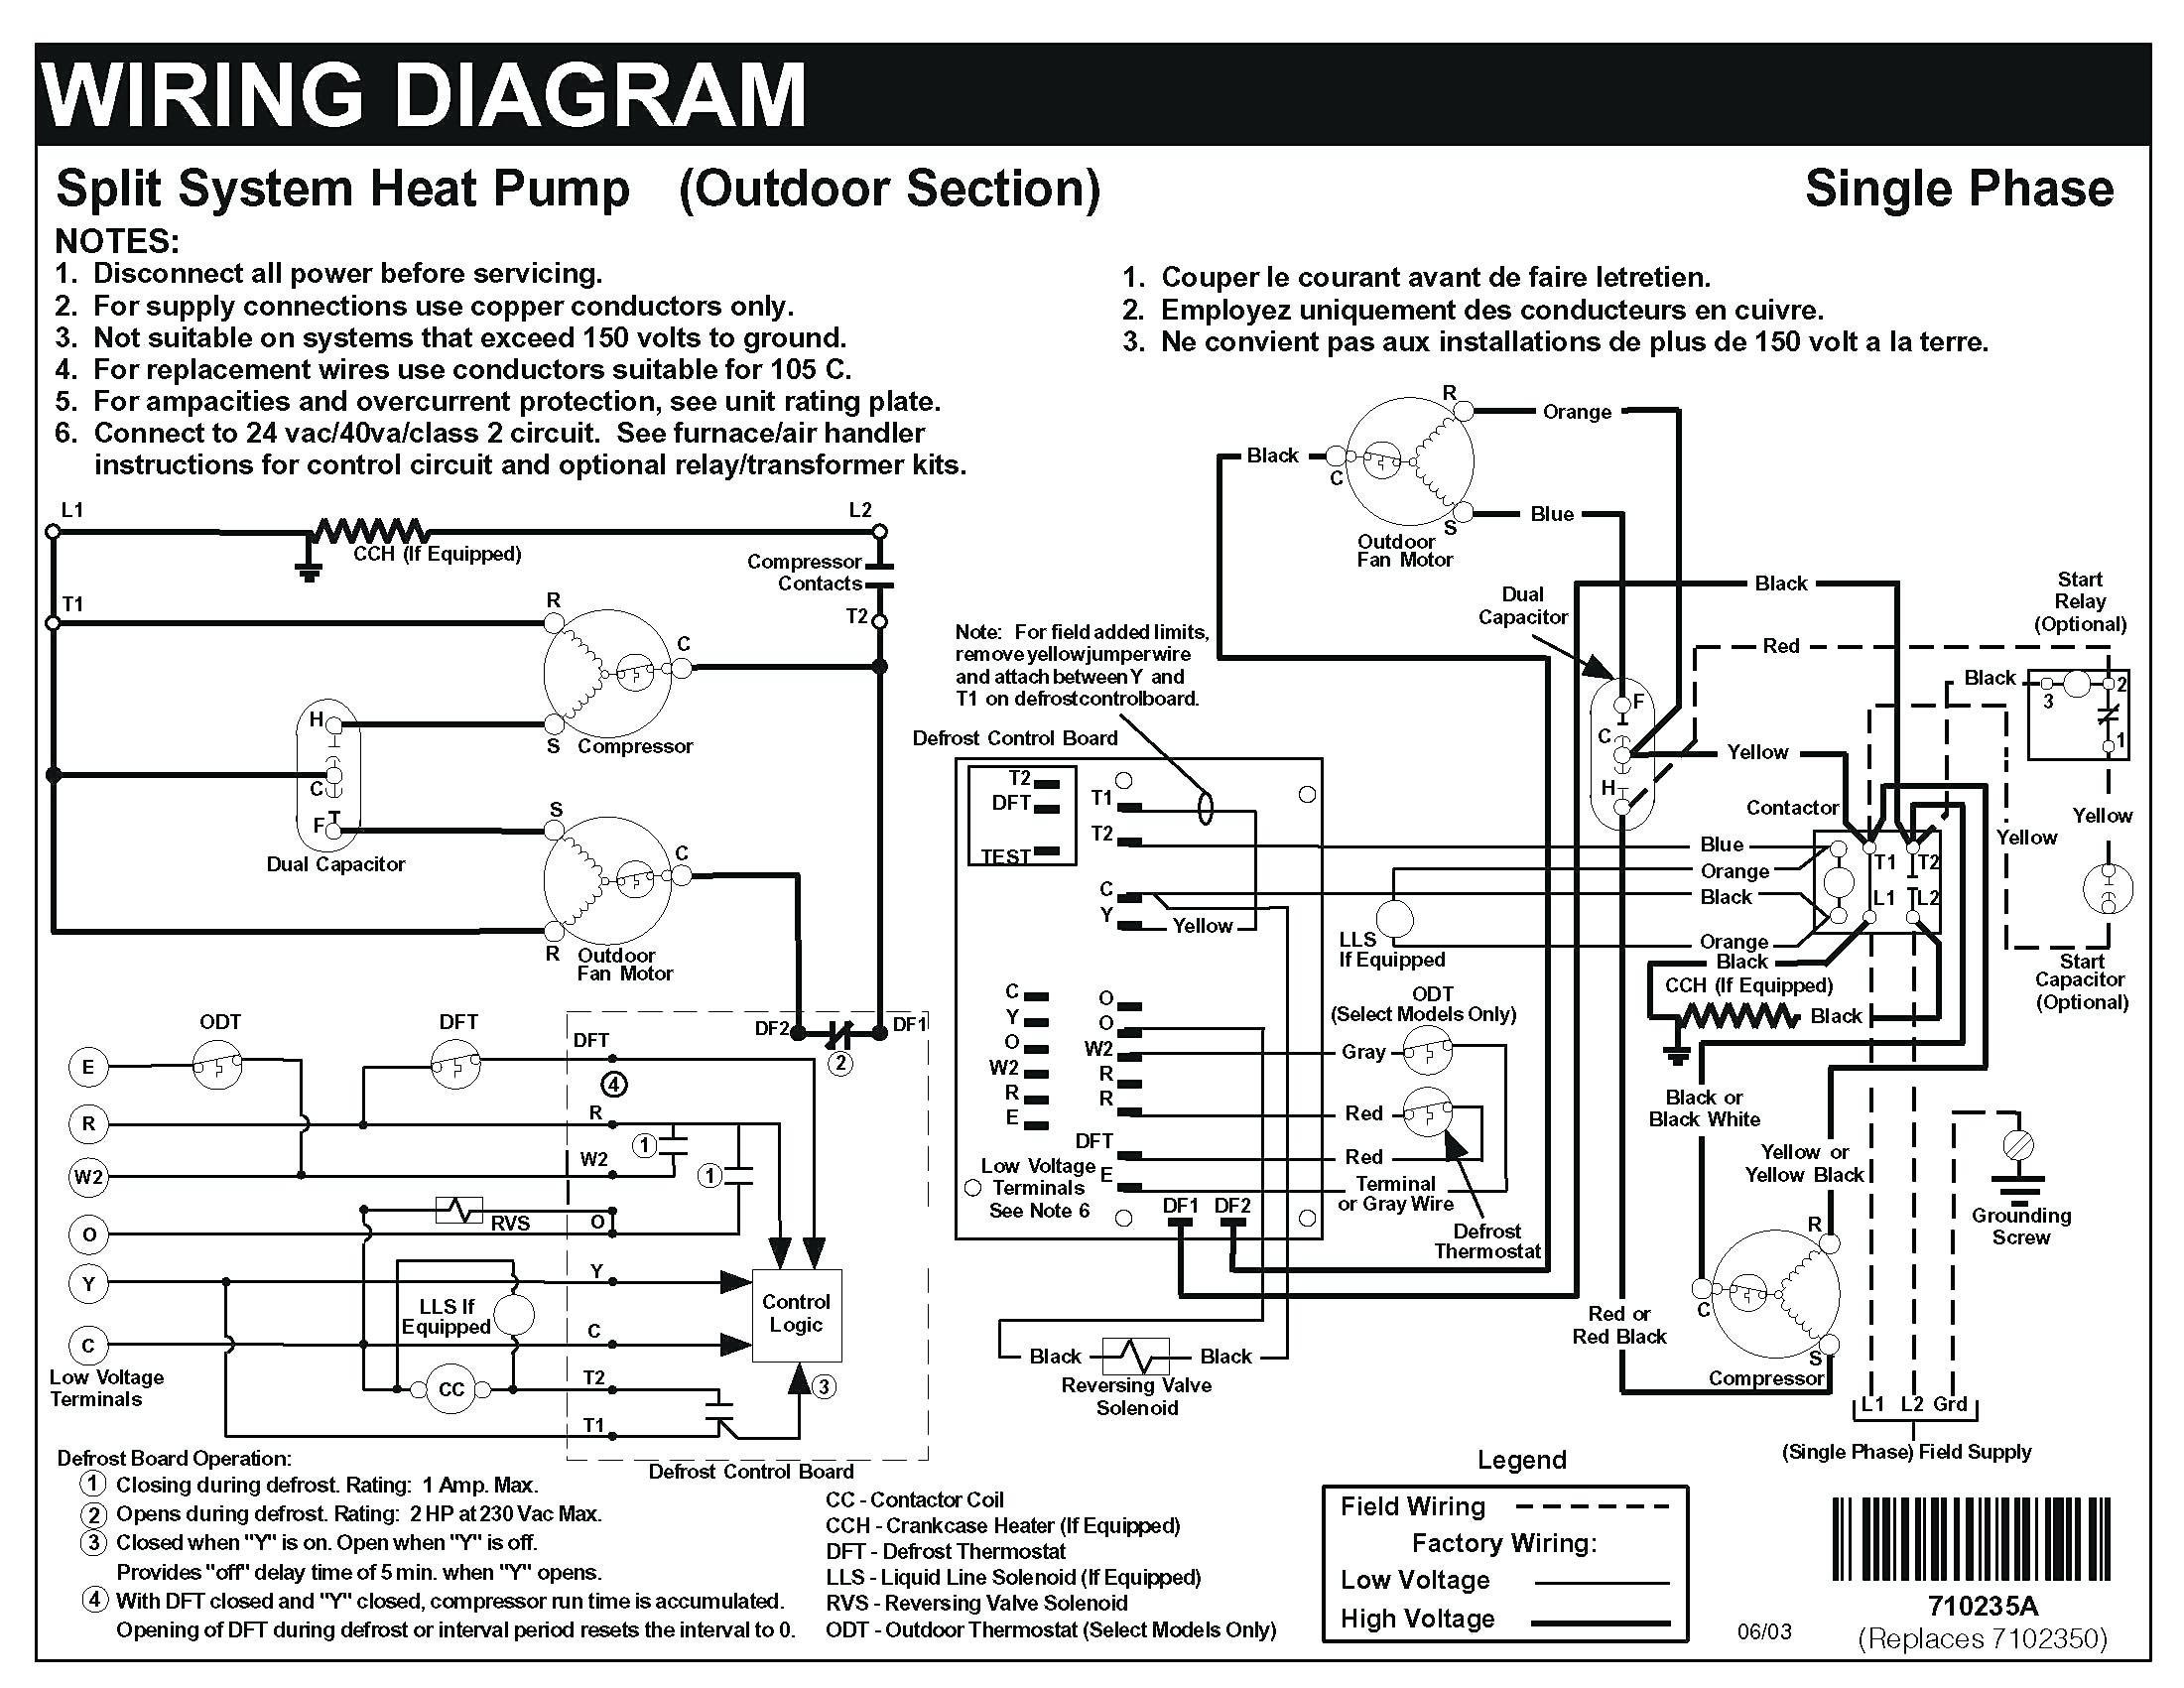 Pioneer Super Tuner Wiring Harness Diagram | Wiring Library - Pioneer Super Tuner 3D Wiring Diagram